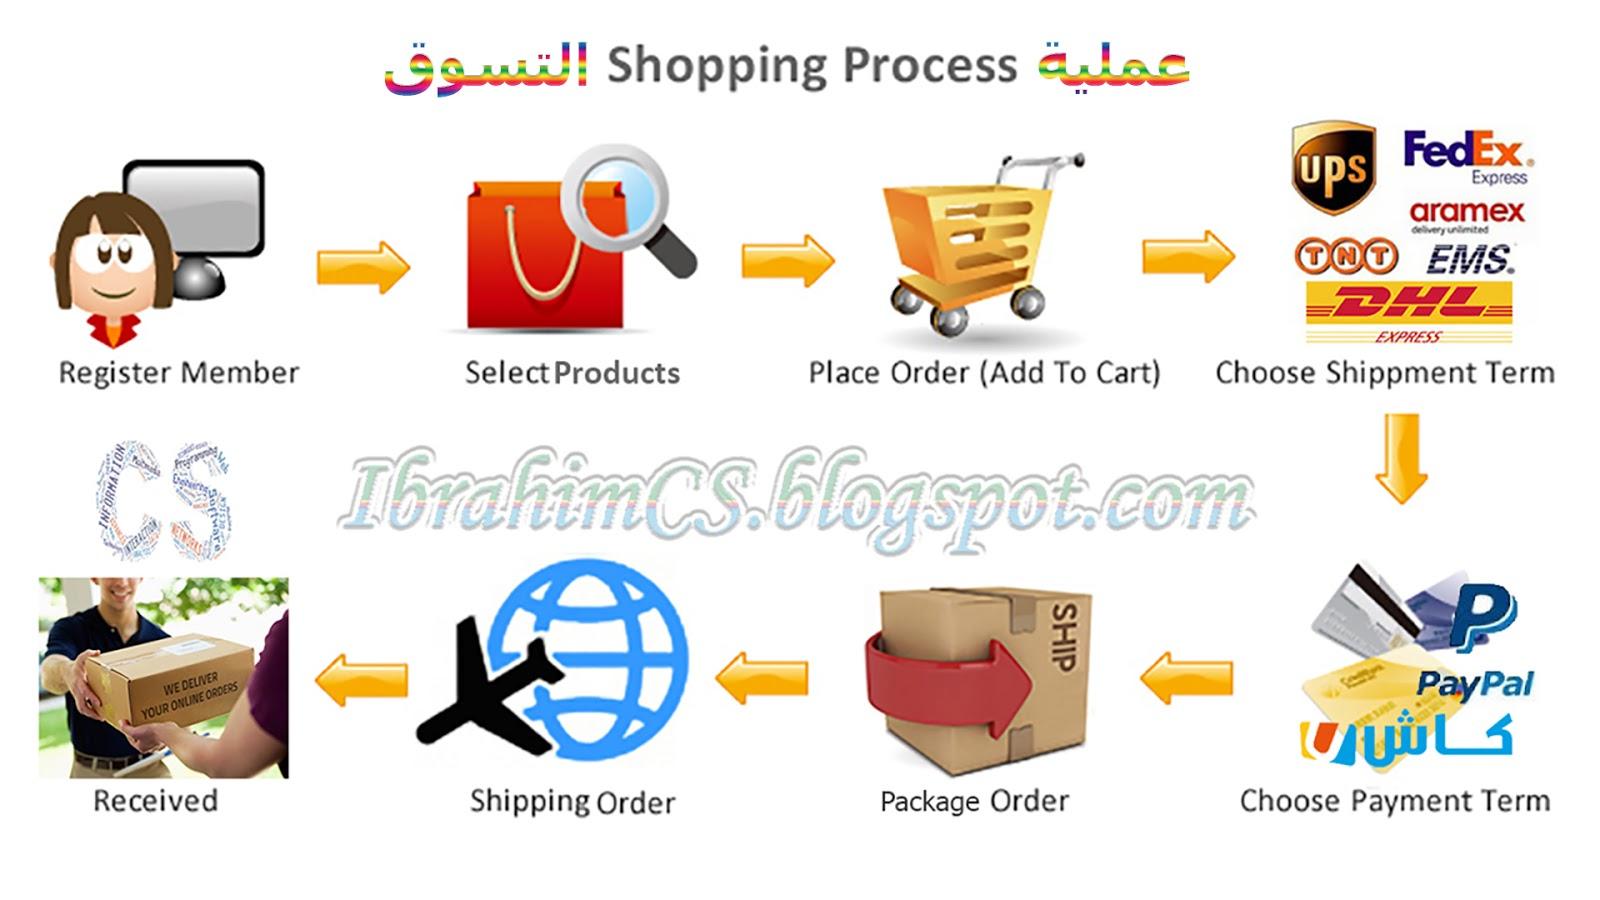 Online Shopping, Shopping Process, Shopping from China, كيفية الشراء من الصين, كيفية التسوق من الصين, التسوق من المواقع الصينية, الشراء عبر الإنترنت